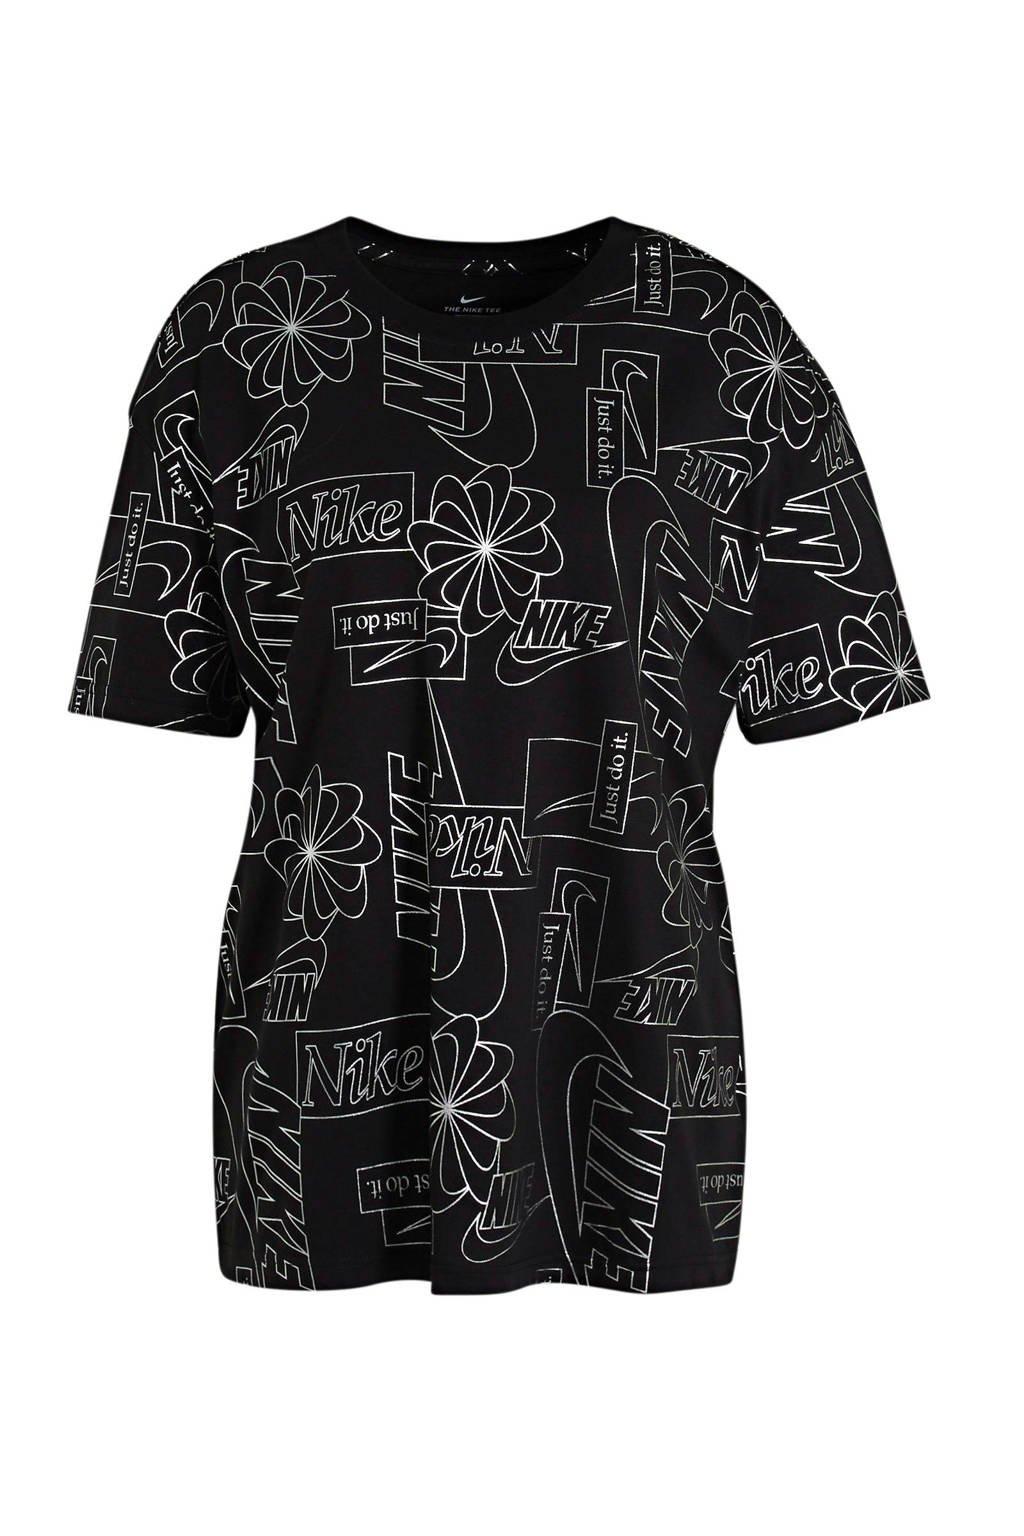 Nike T-shirt zwart/wit, Zwart